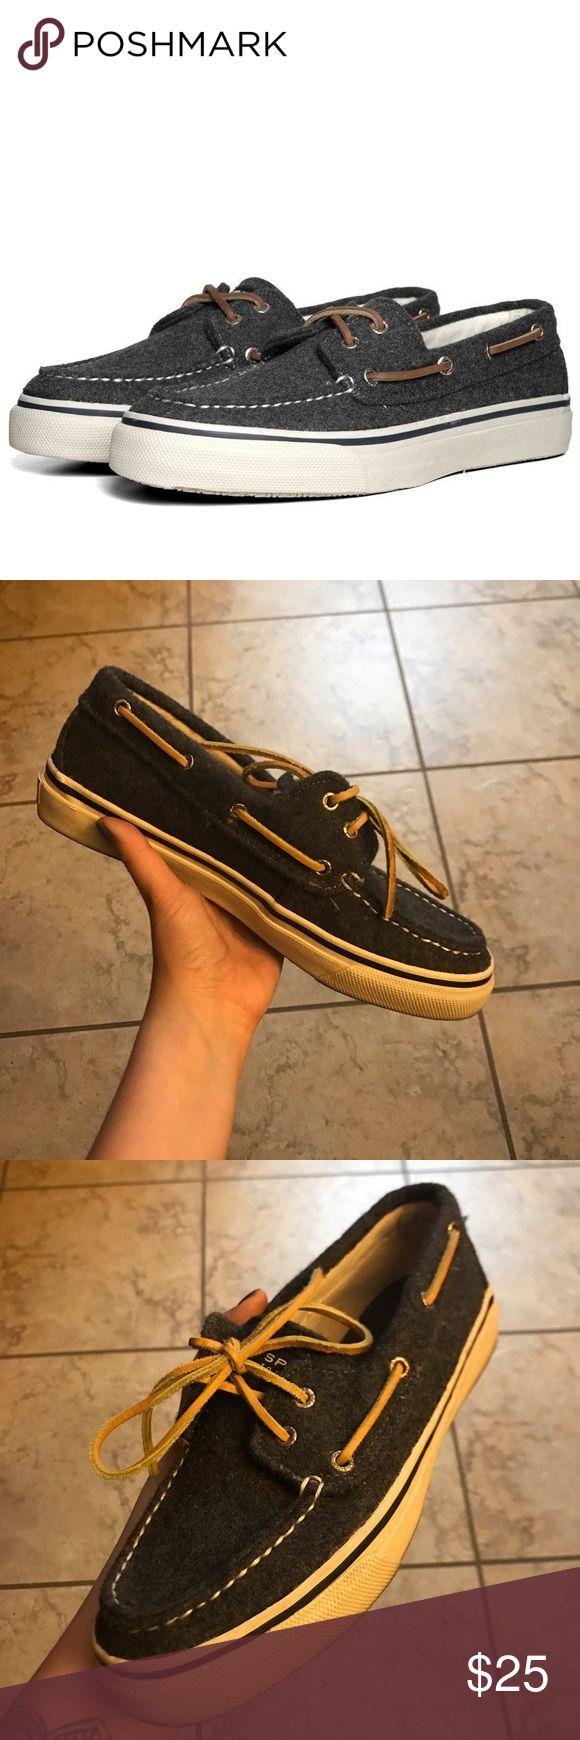 Sperry Men's Boat Shoes Sperry Men's Boat Shoes / Color: Grey Sperry Top-Sider Shoes Boat Shoes